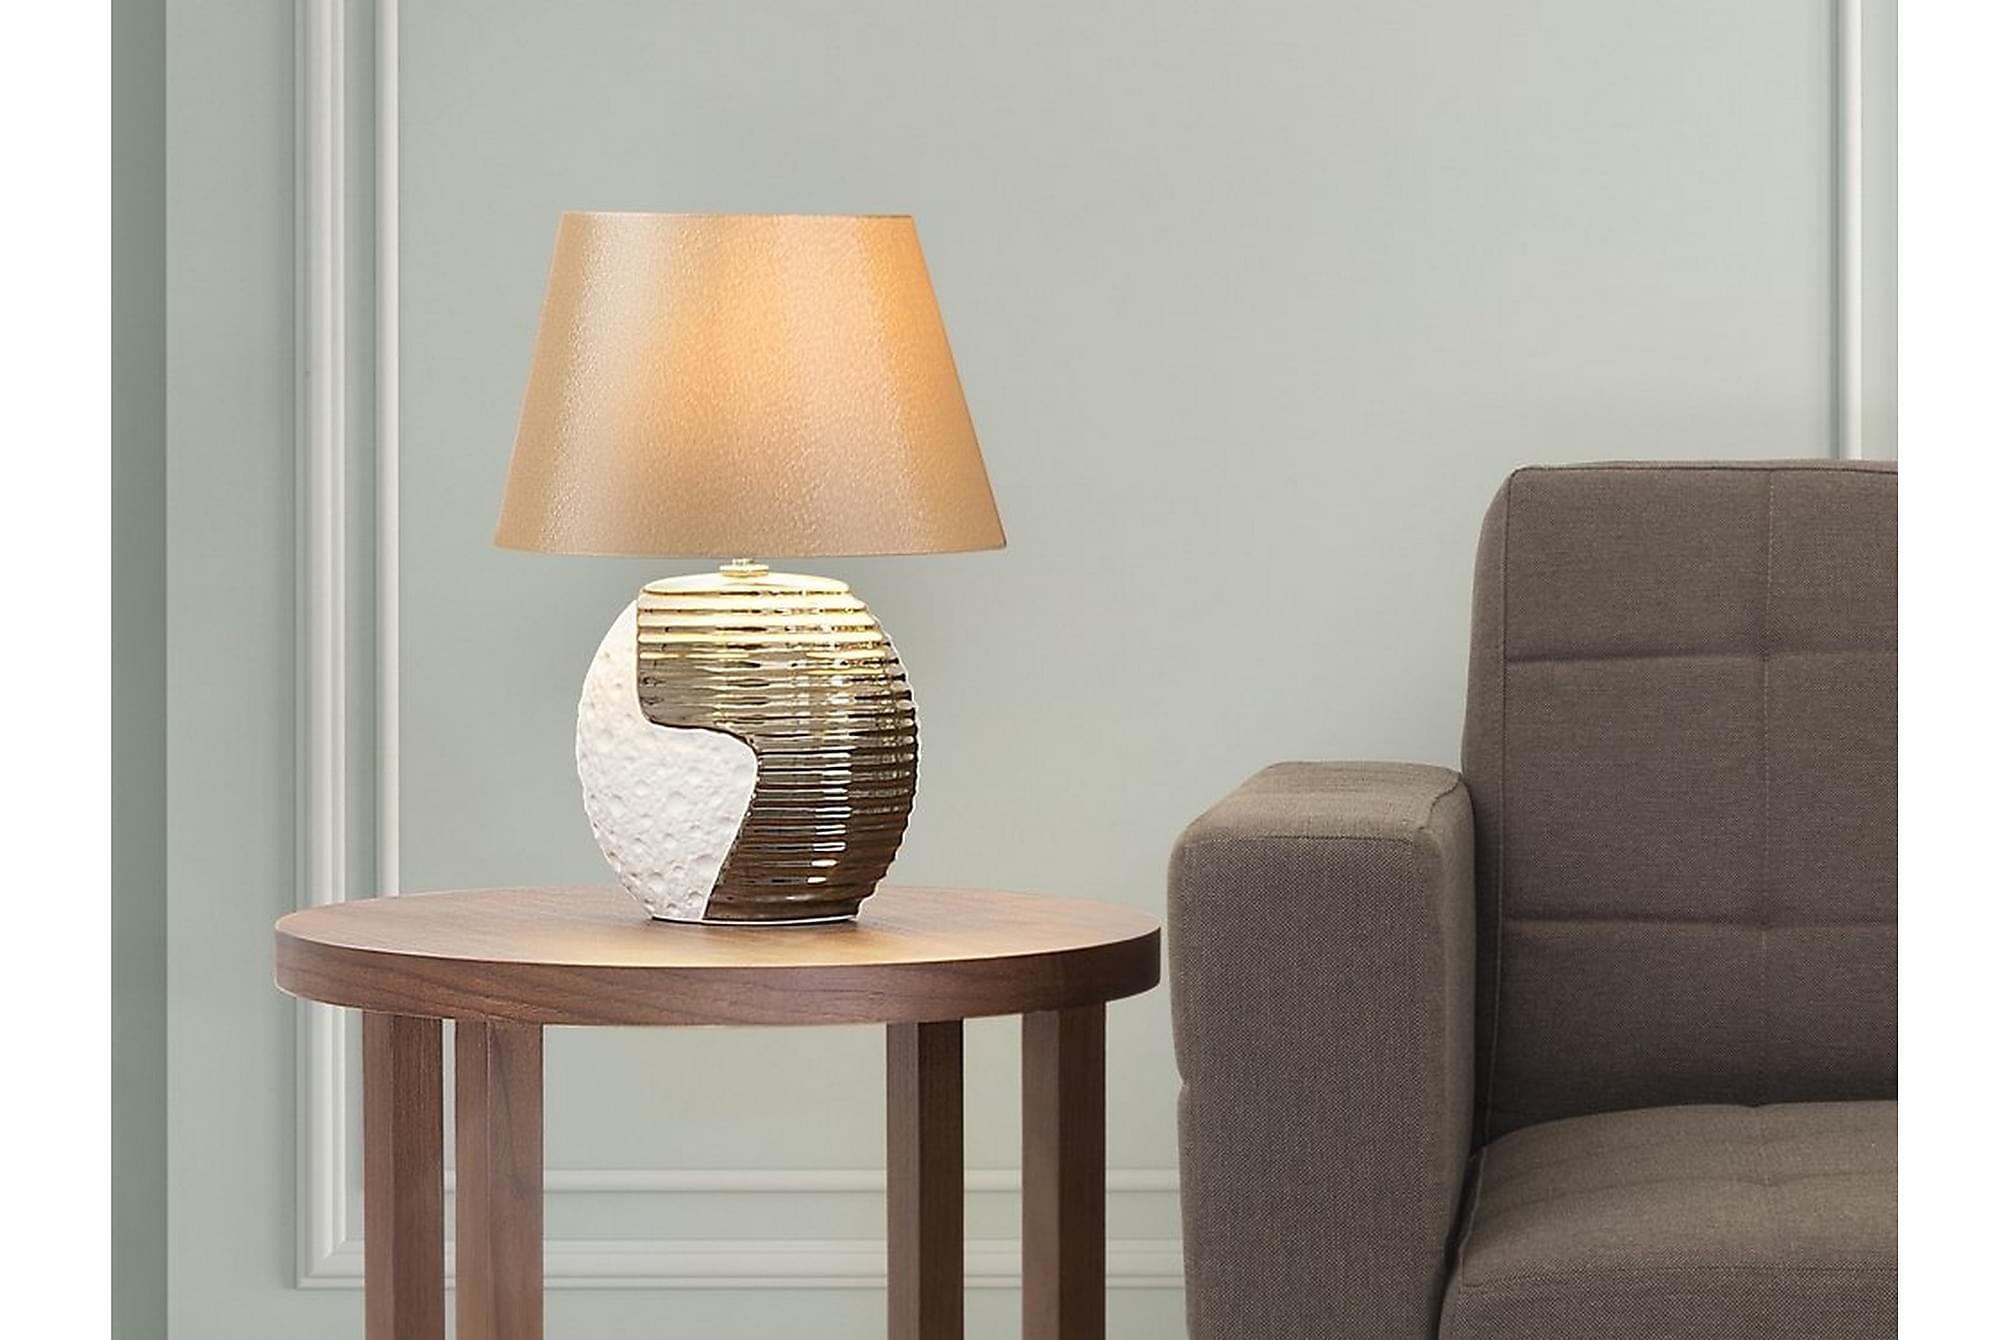 ESLA Bordslampa 30 cm